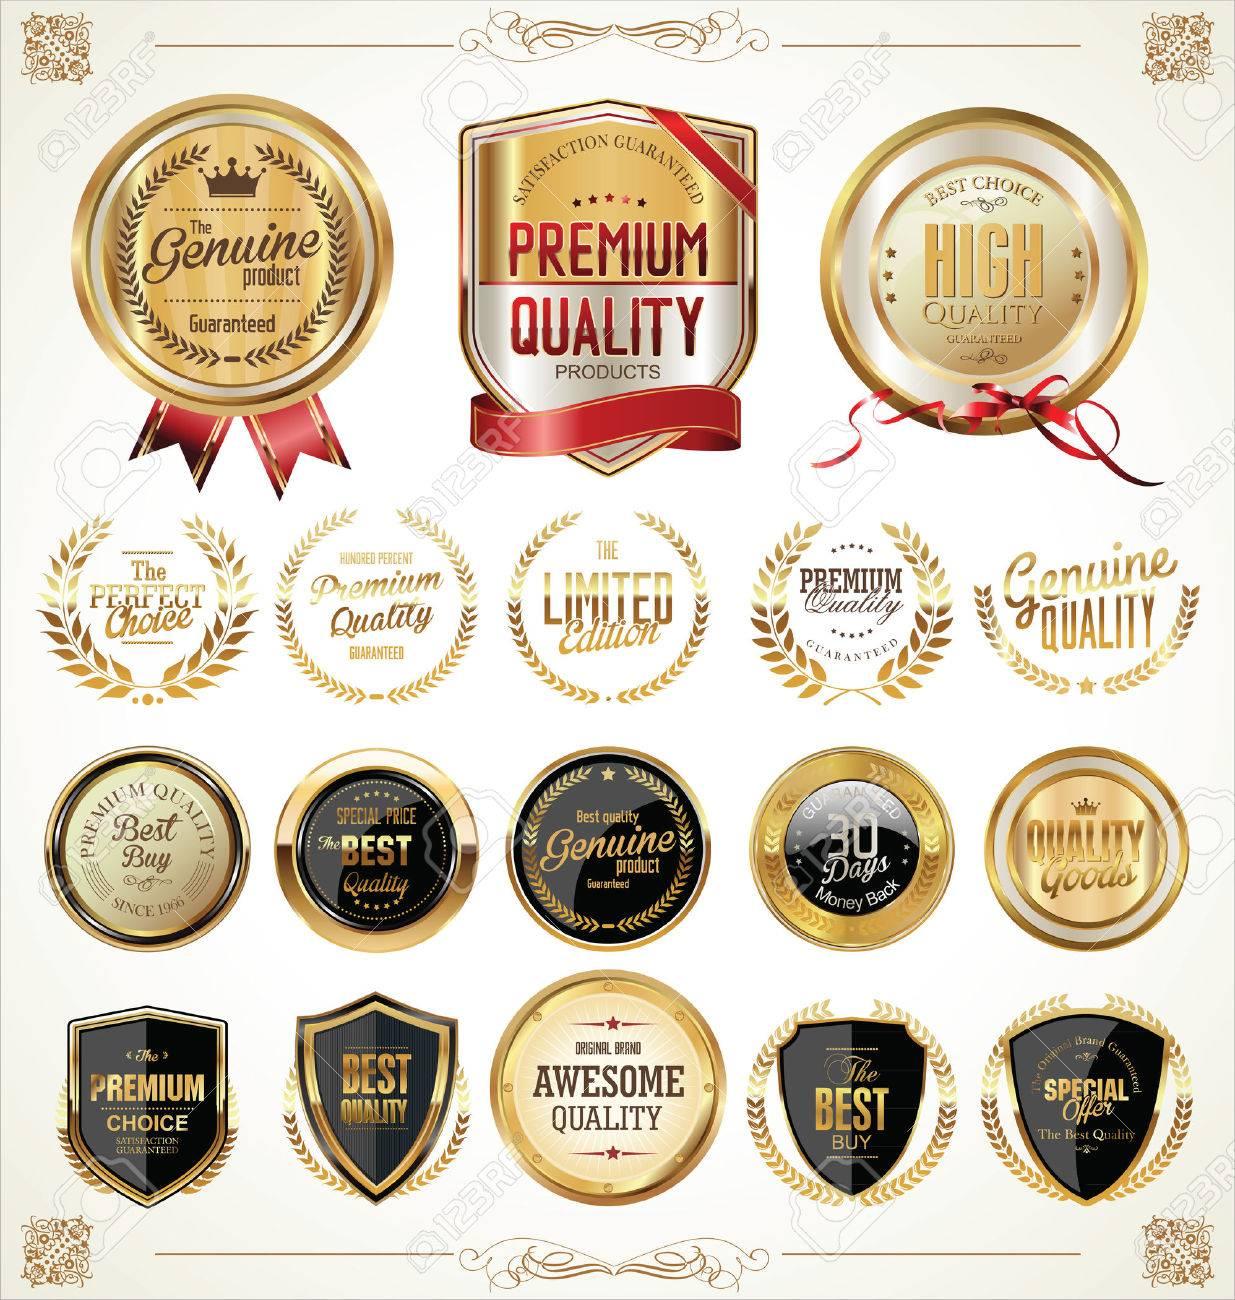 Golden labels collection illustration - 40073162